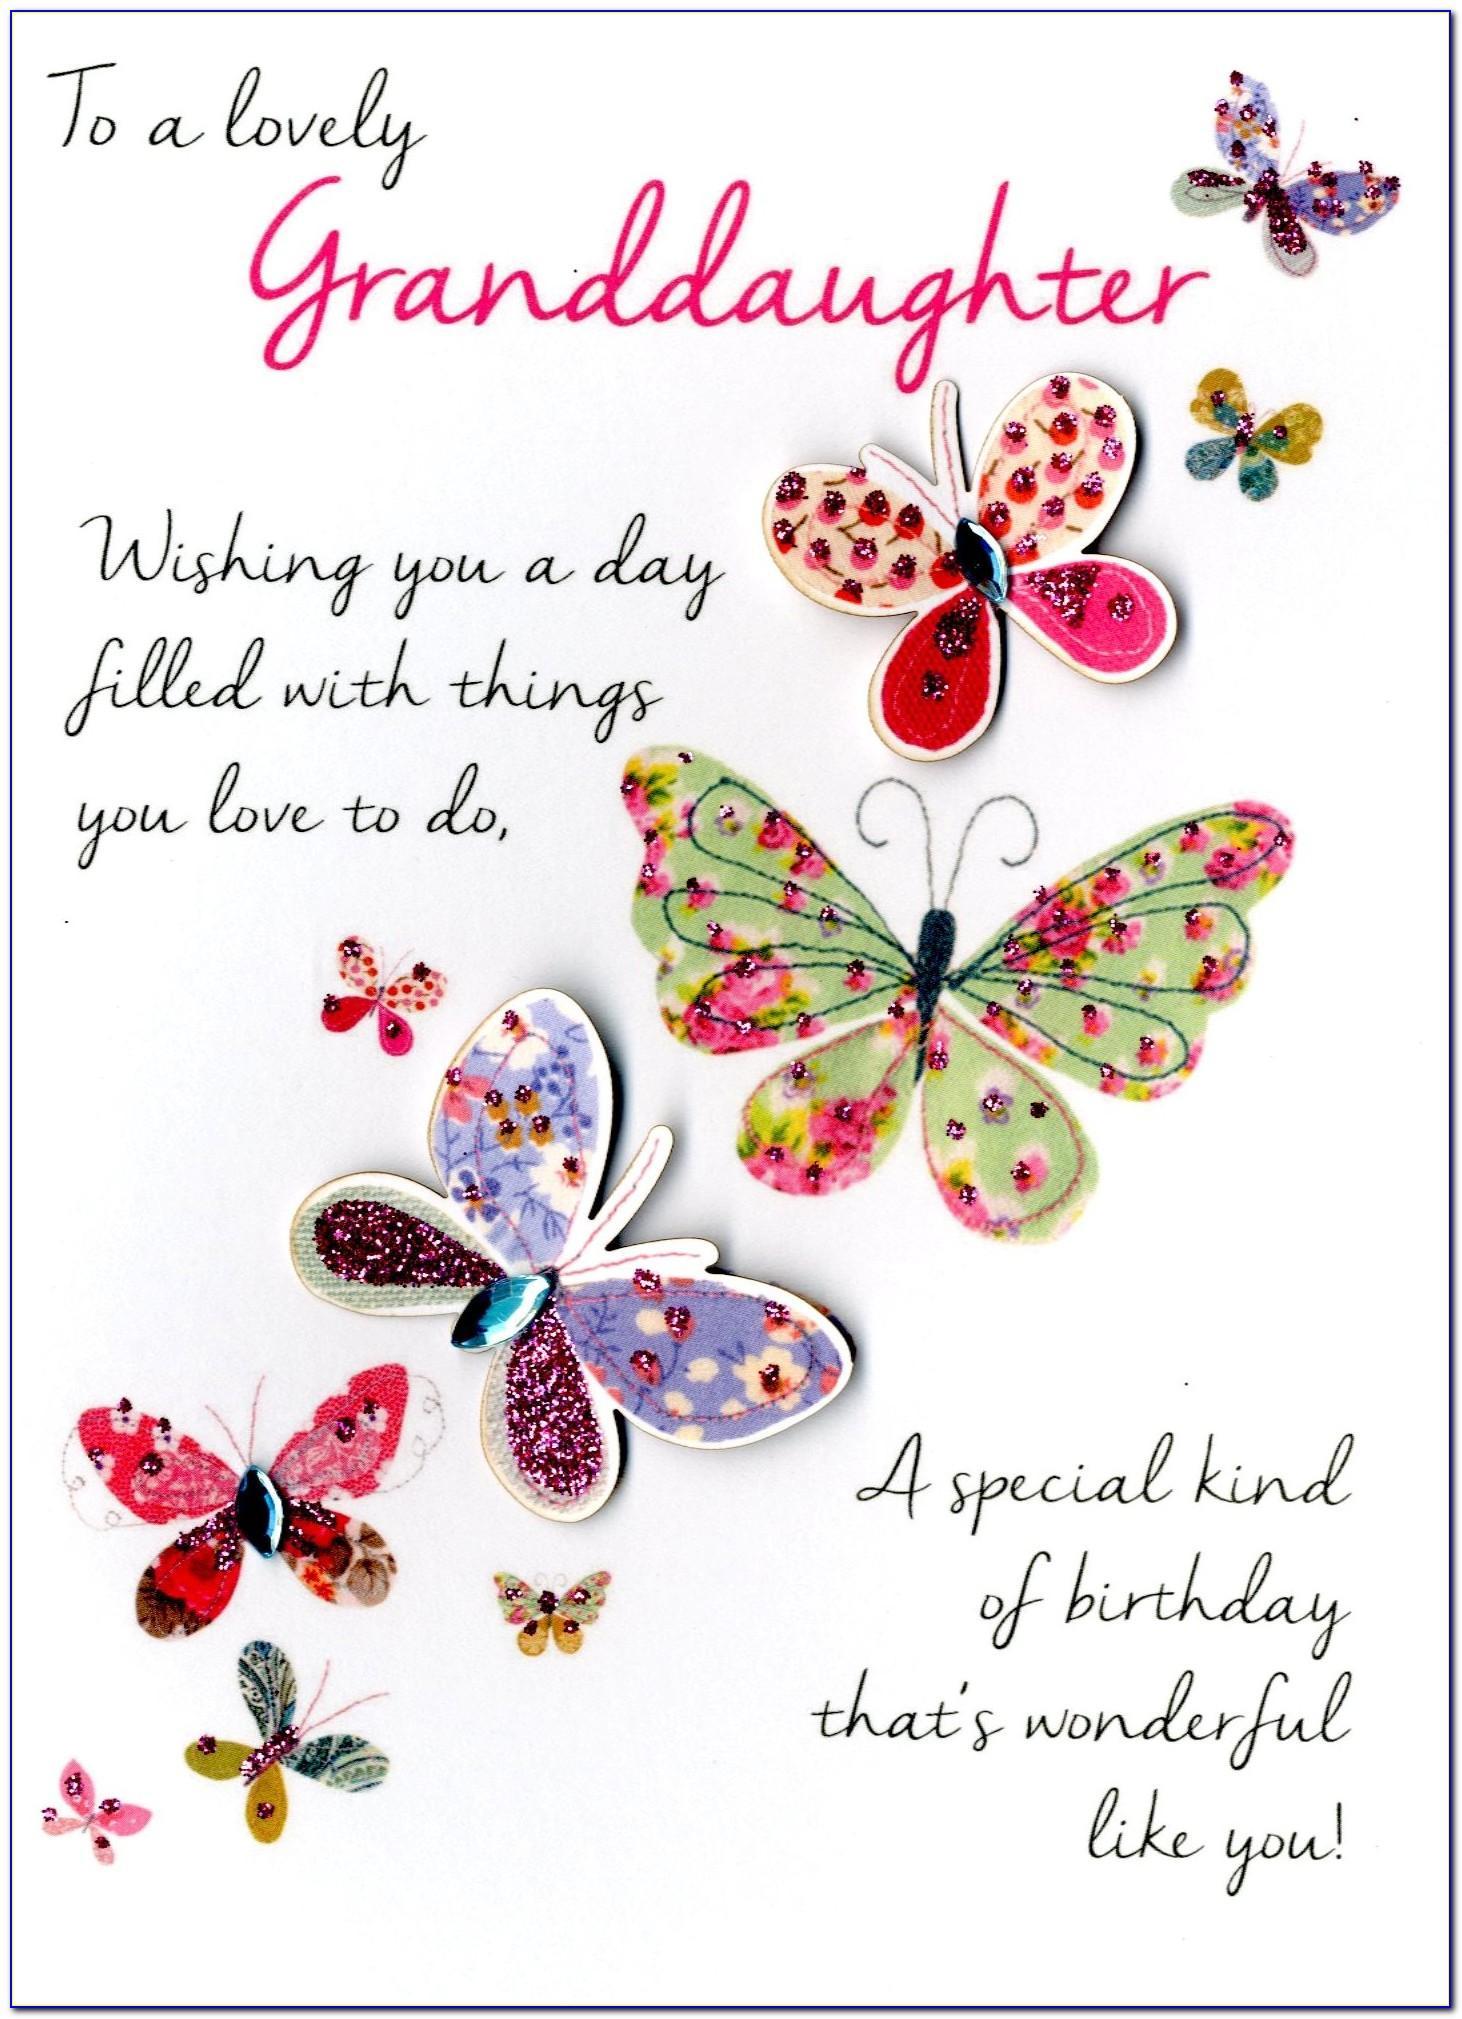 Great Granddaughter Birthday Card Verses